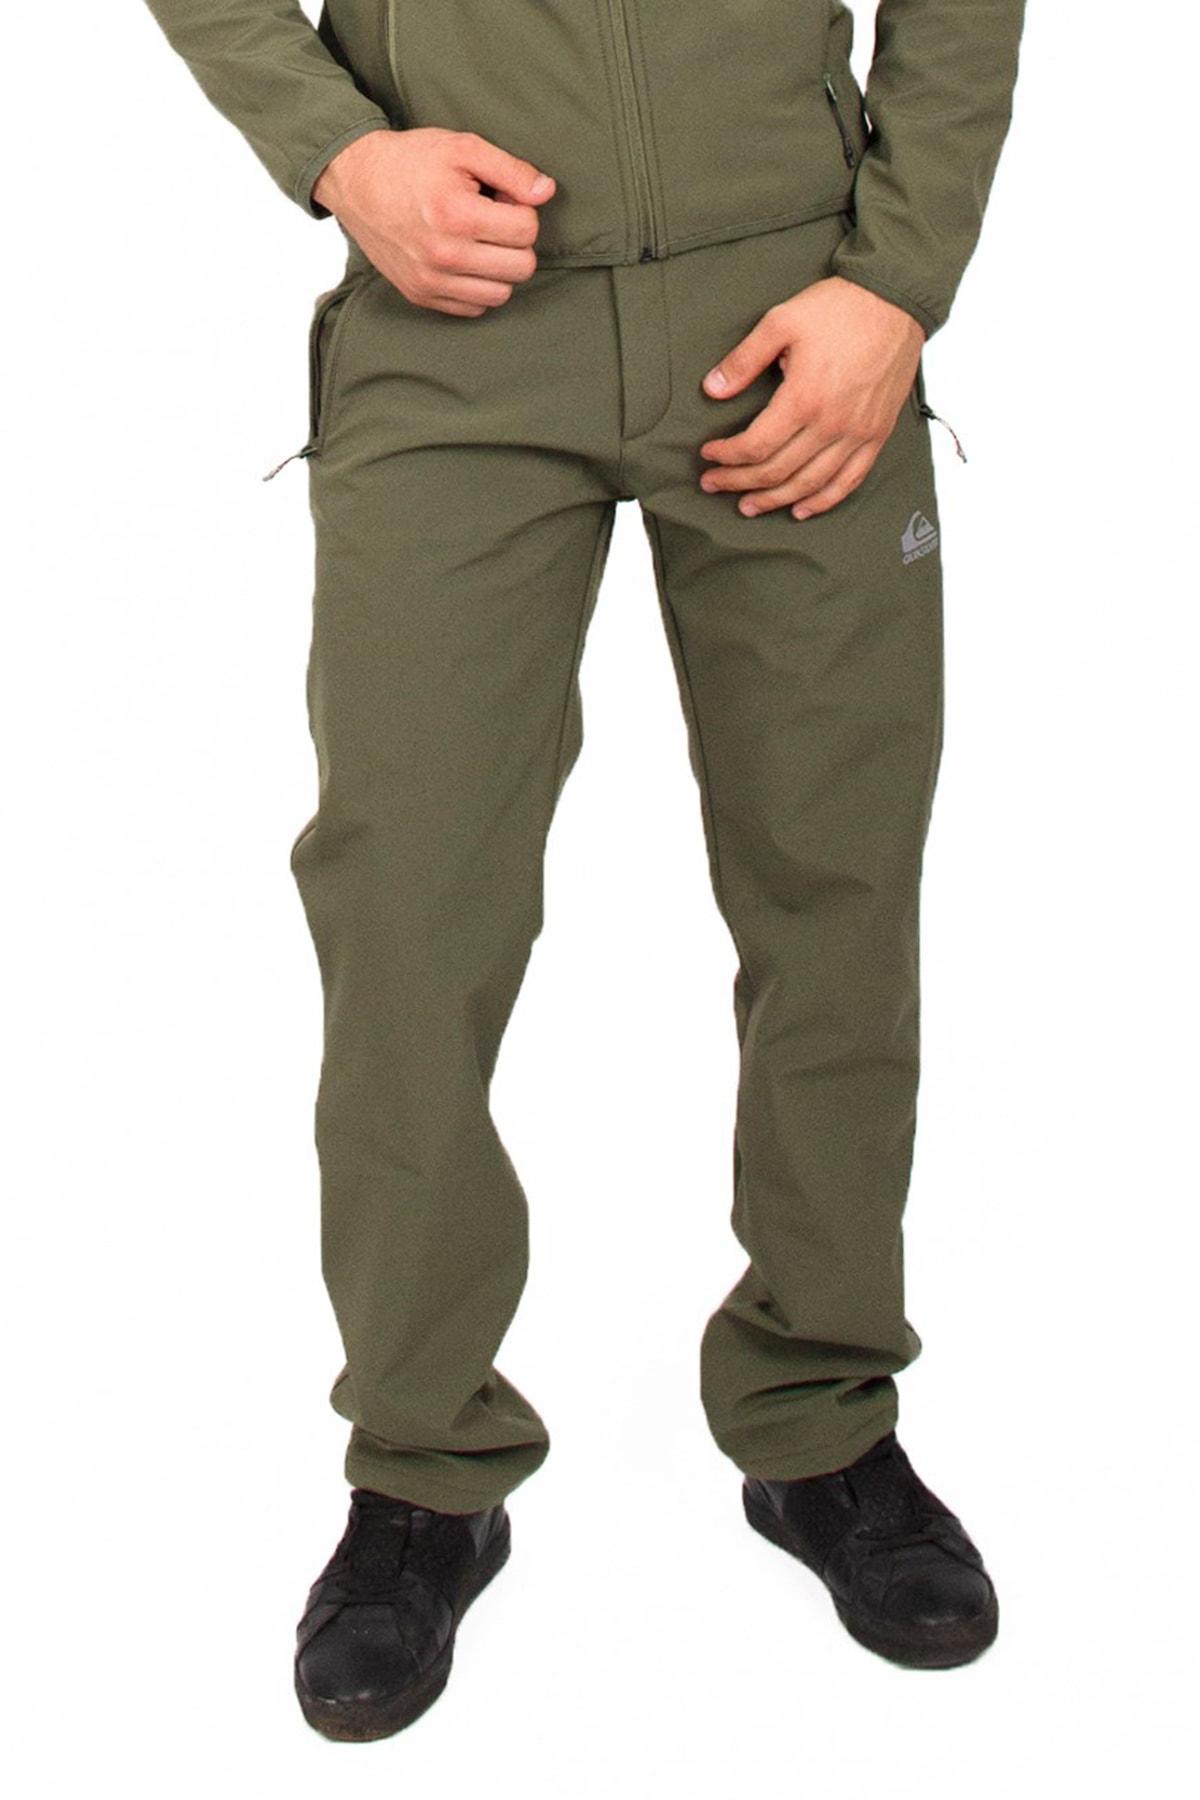 Quiksilver Erkek Pantolon - OD Softshell - EQYNP03712T 1